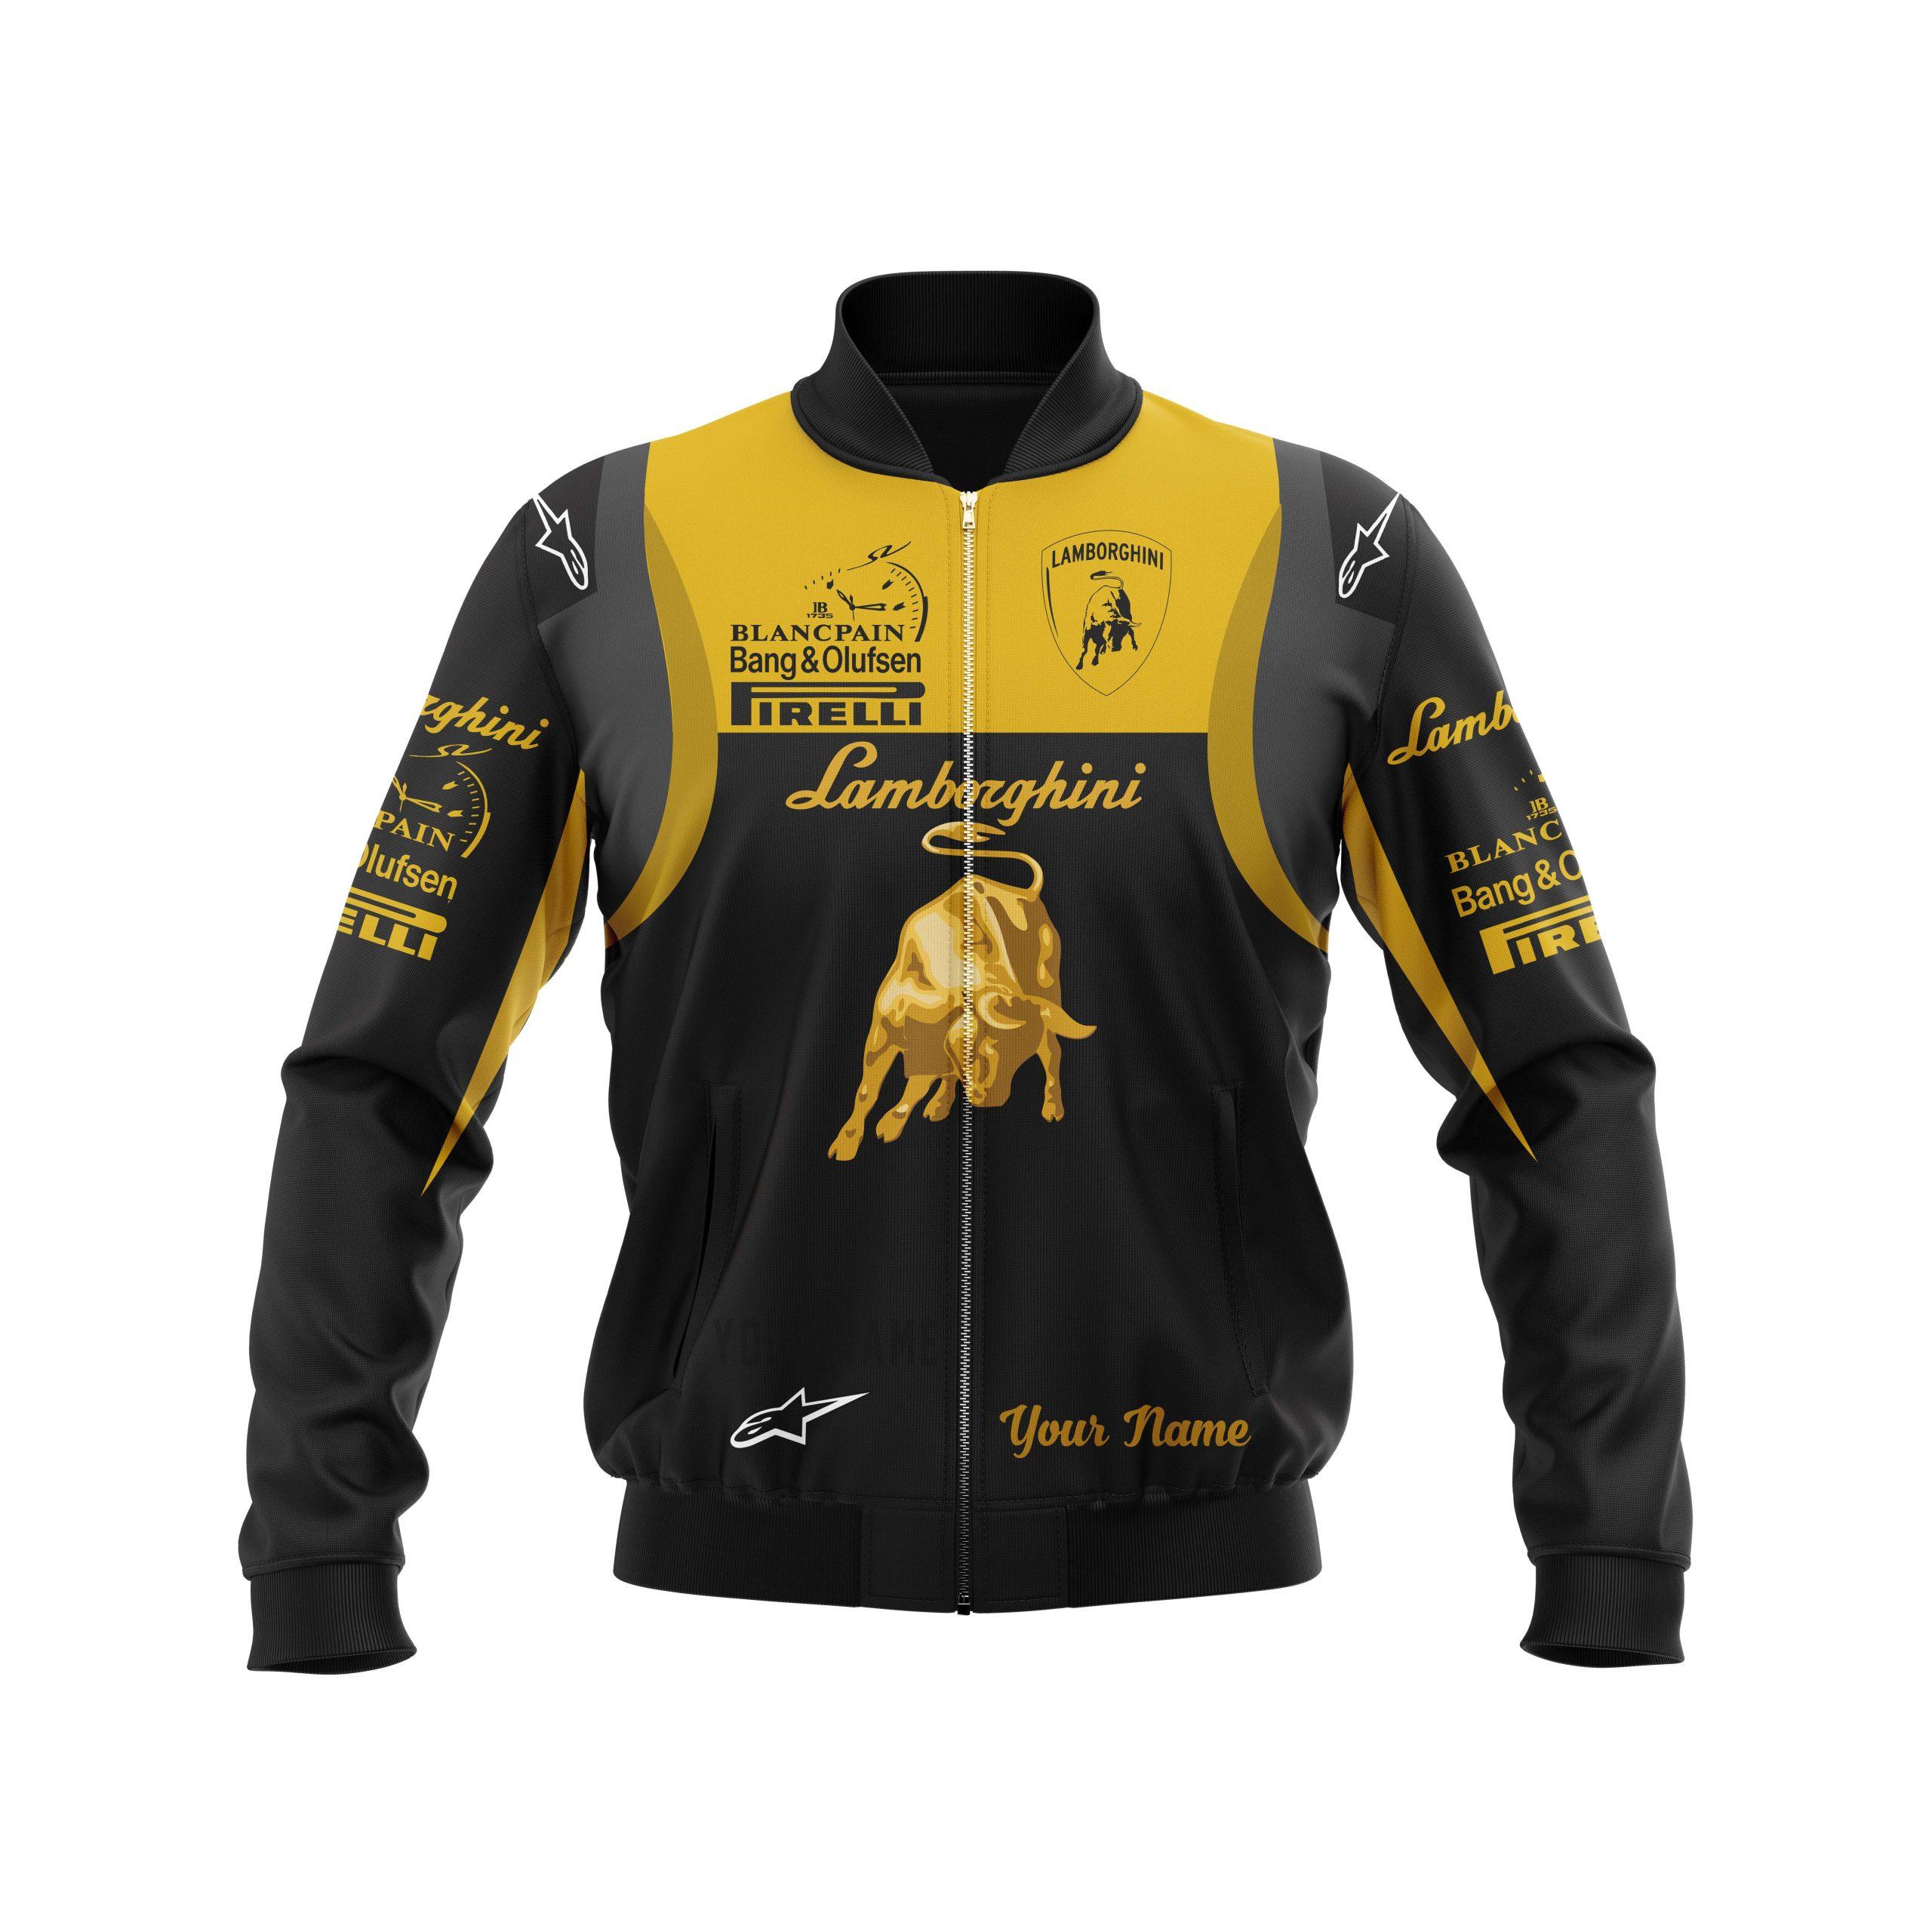 Personalized Lamborghini Formula 1 3D bomber jacket